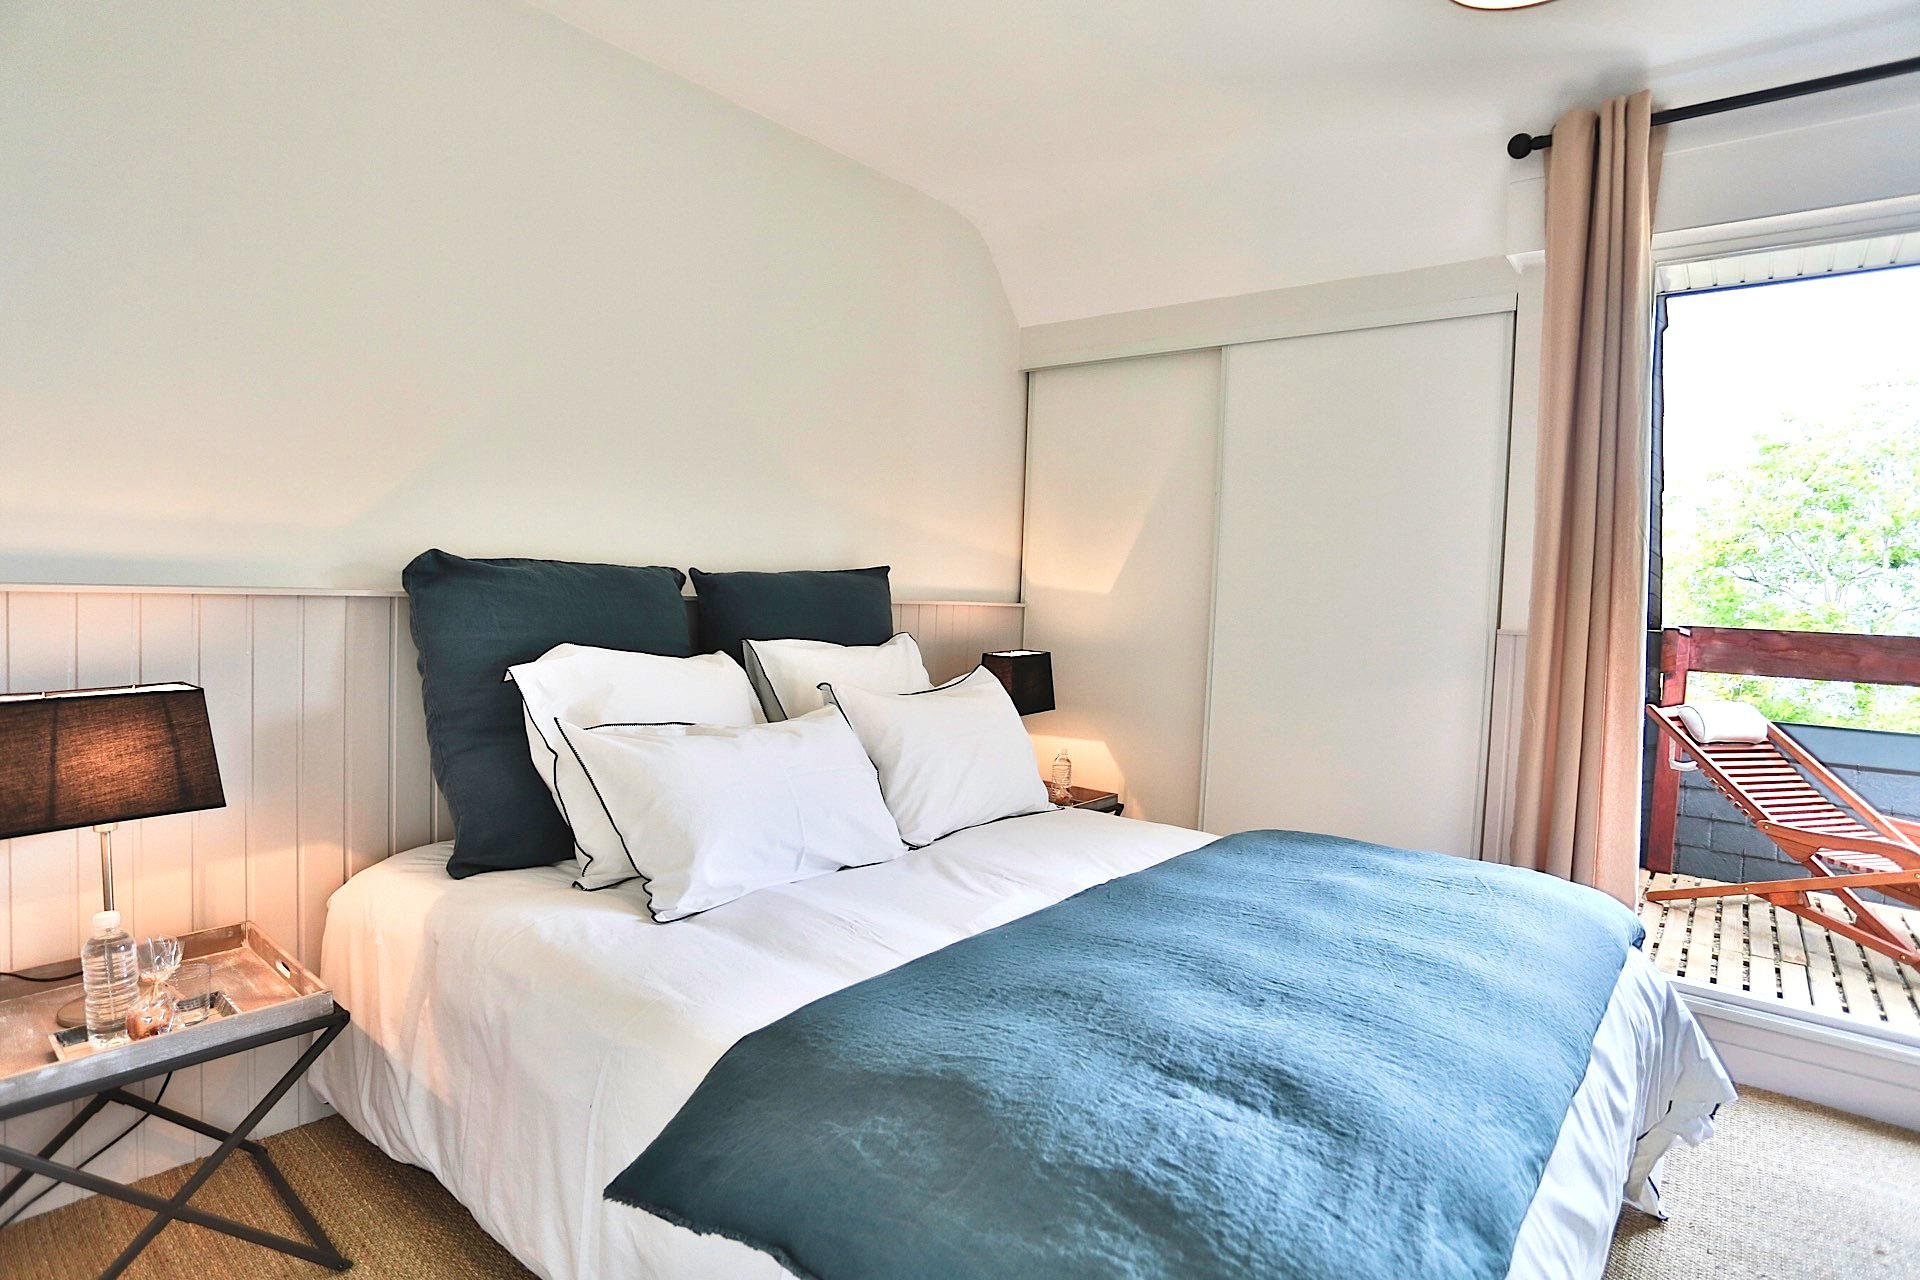 luxe chambre d hote golfe du morbihan. Black Bedroom Furniture Sets. Home Design Ideas